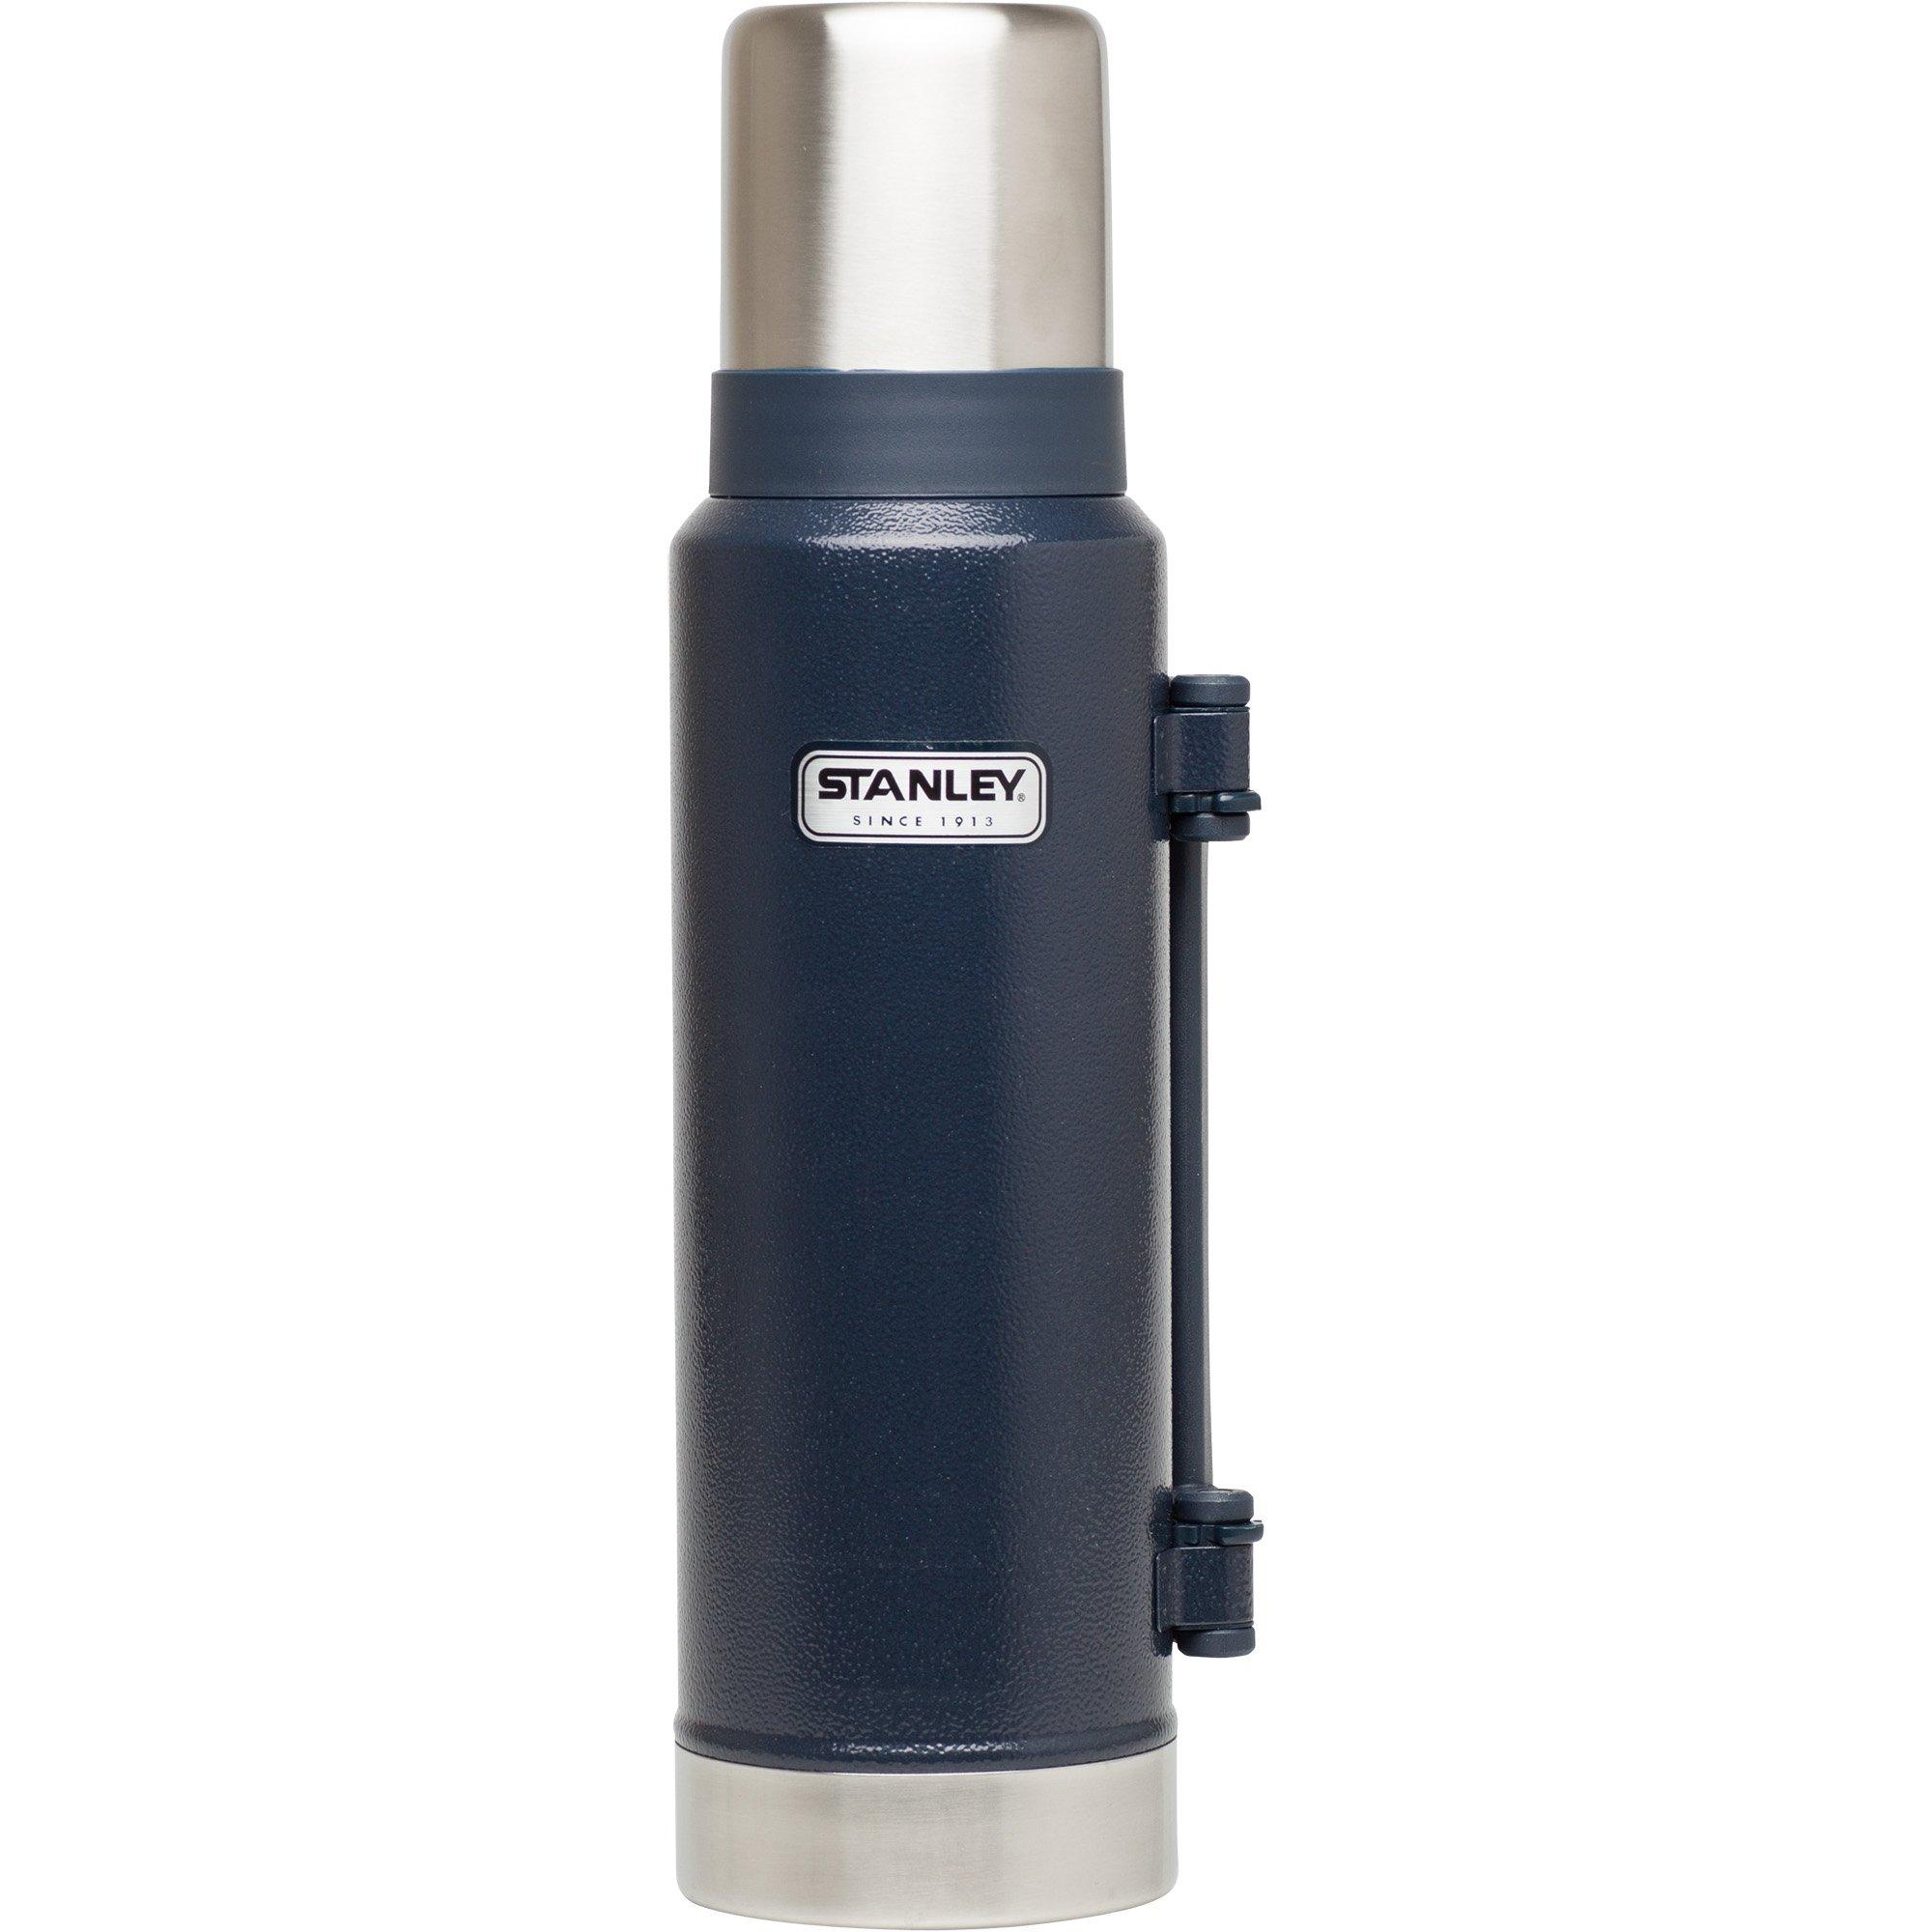 Stanley Classic Ultra Vacuum Bottle, Hammertone Navy, 1.4 Quart by Stanley (Image #1)